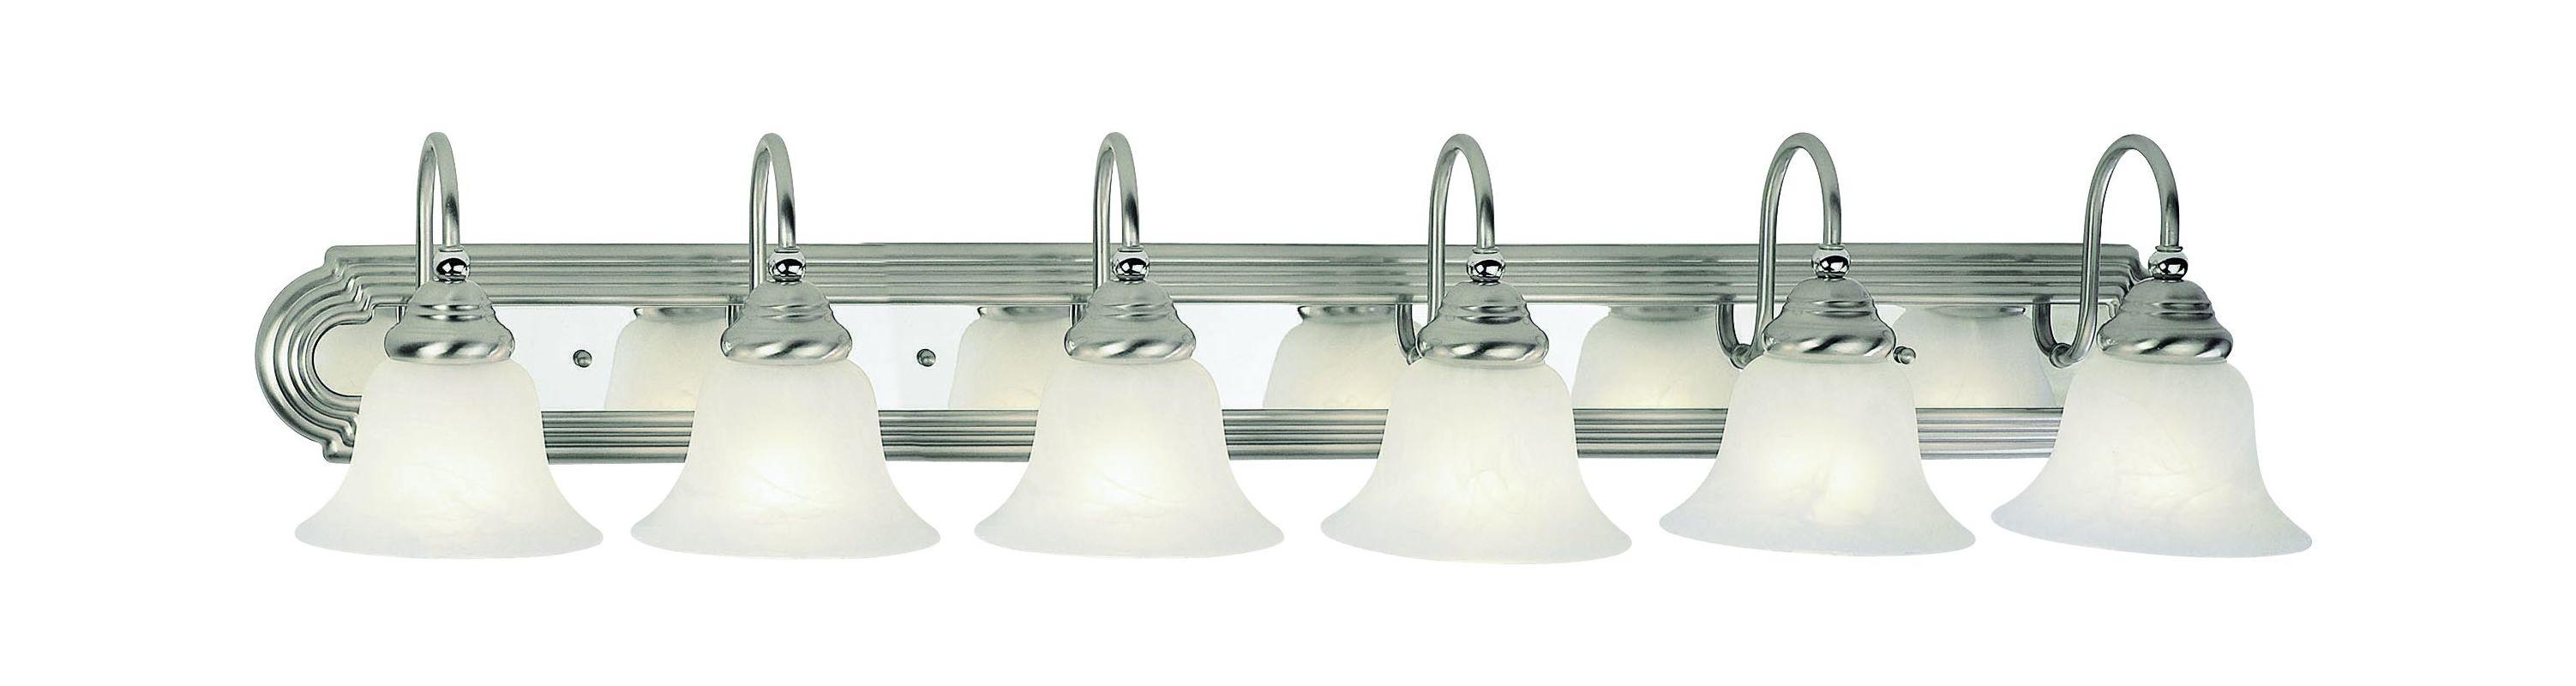 Livex Lighting 1006 Belmont 6 Light Vanity Light Brushed Nickel /